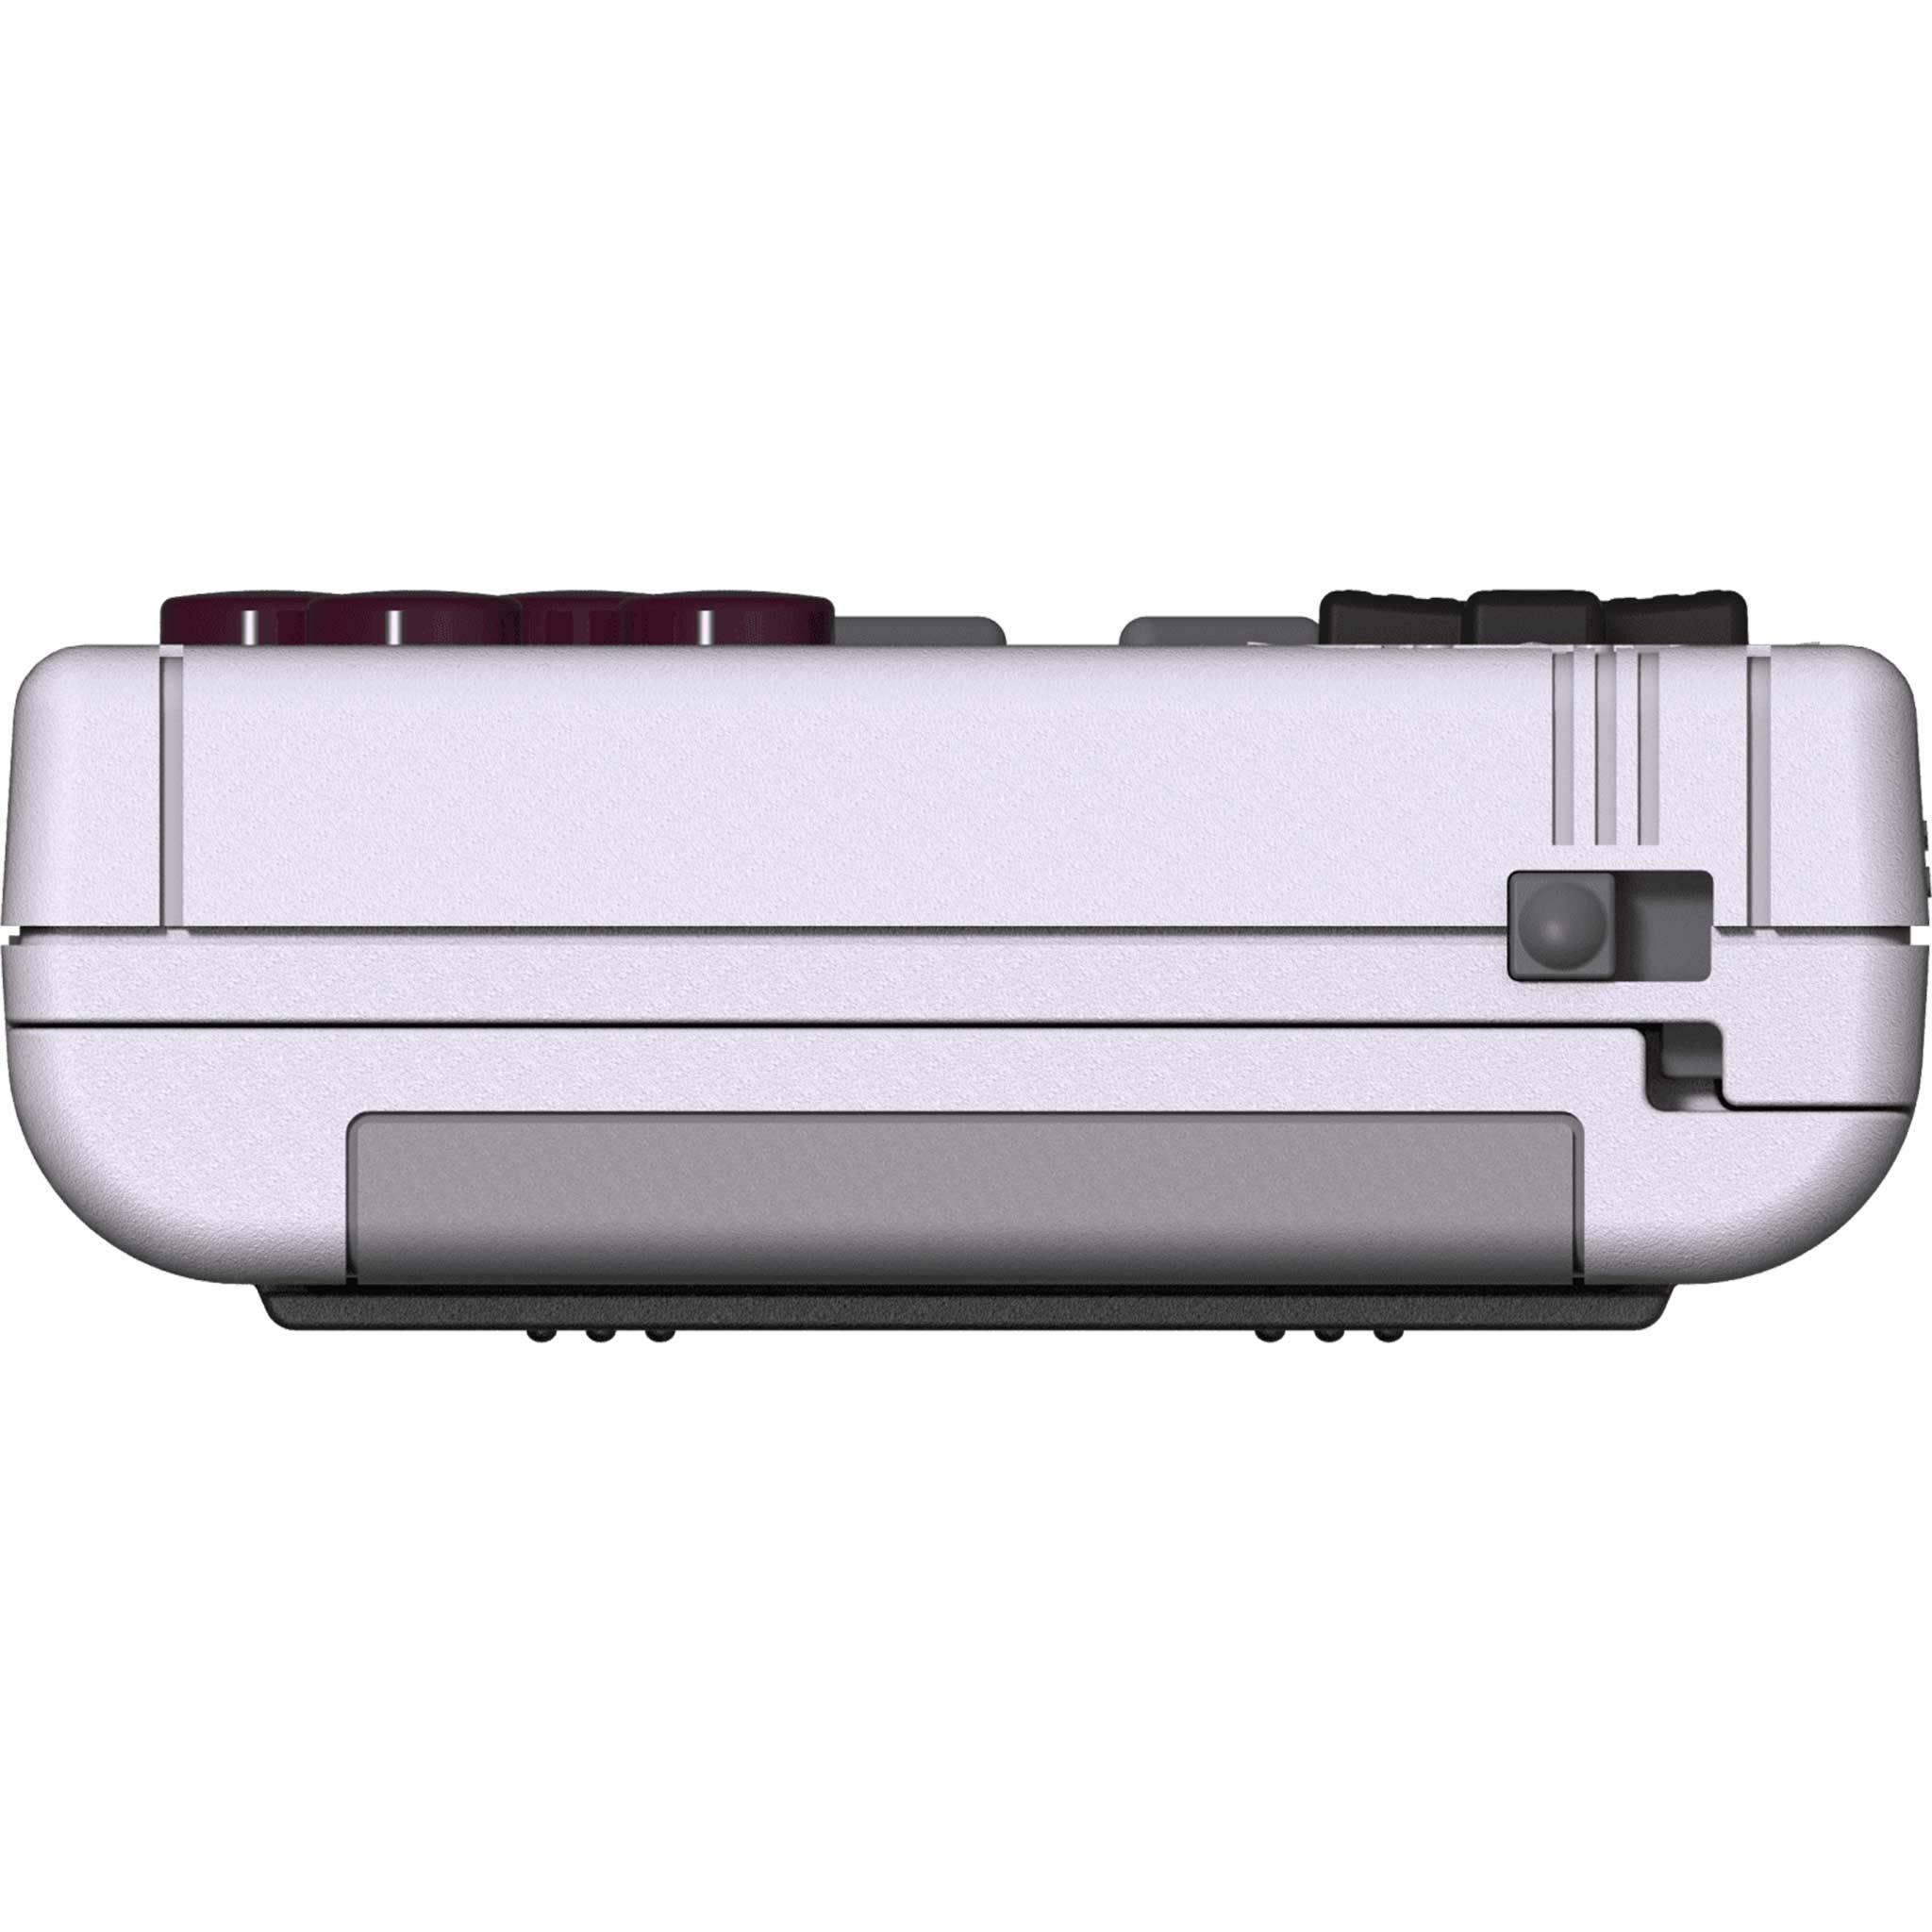 RETROFLAG GPi Case showing Cartridge for Raspberry Pi zero W and Power Button